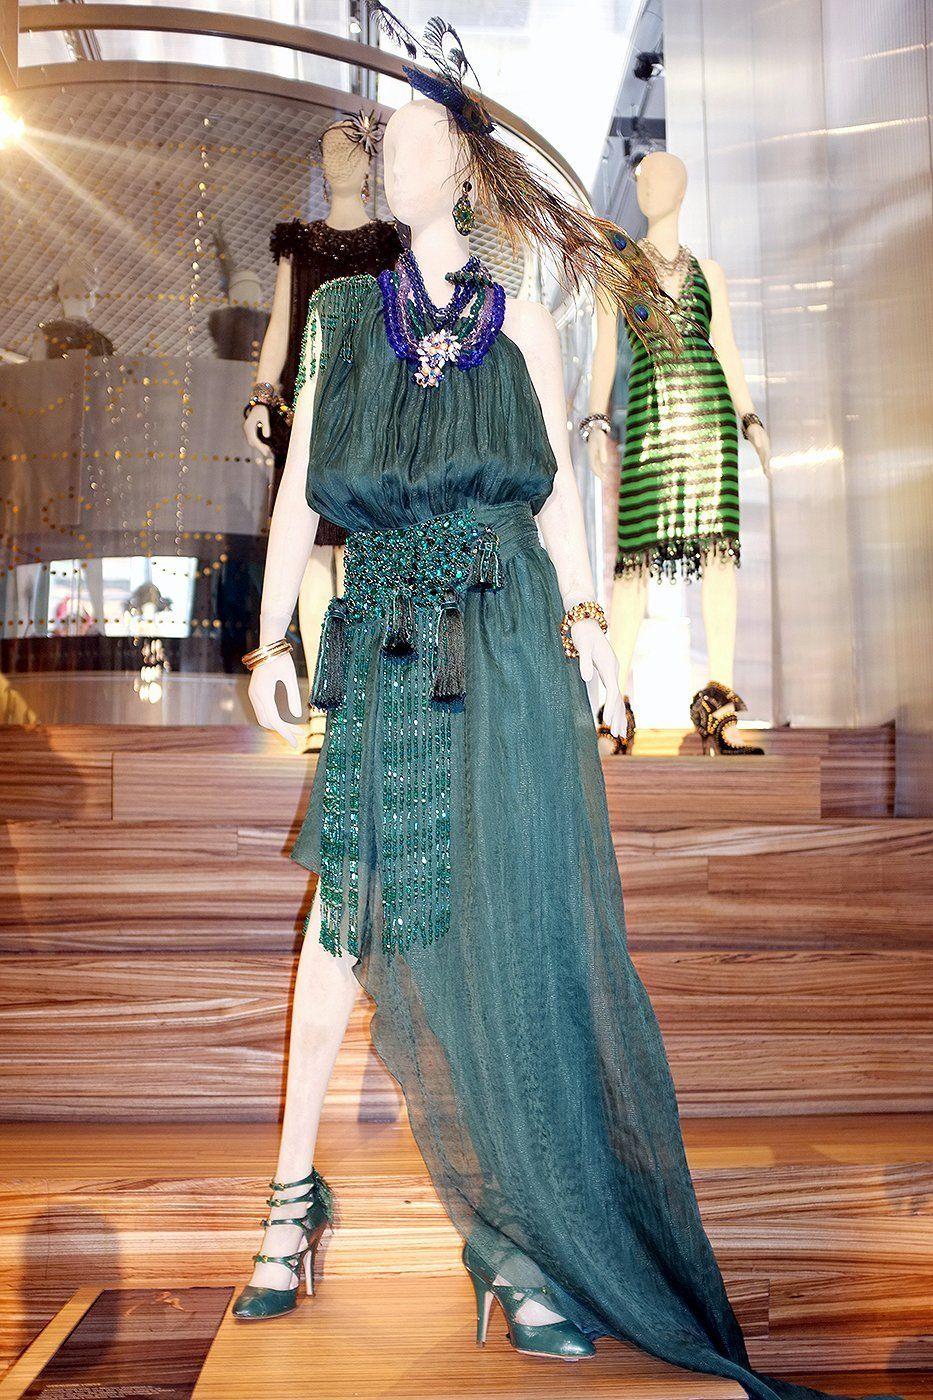 Catherine Martin-Miuccia Prada Dress The Great Gatsby 2013 | Gatsby ...